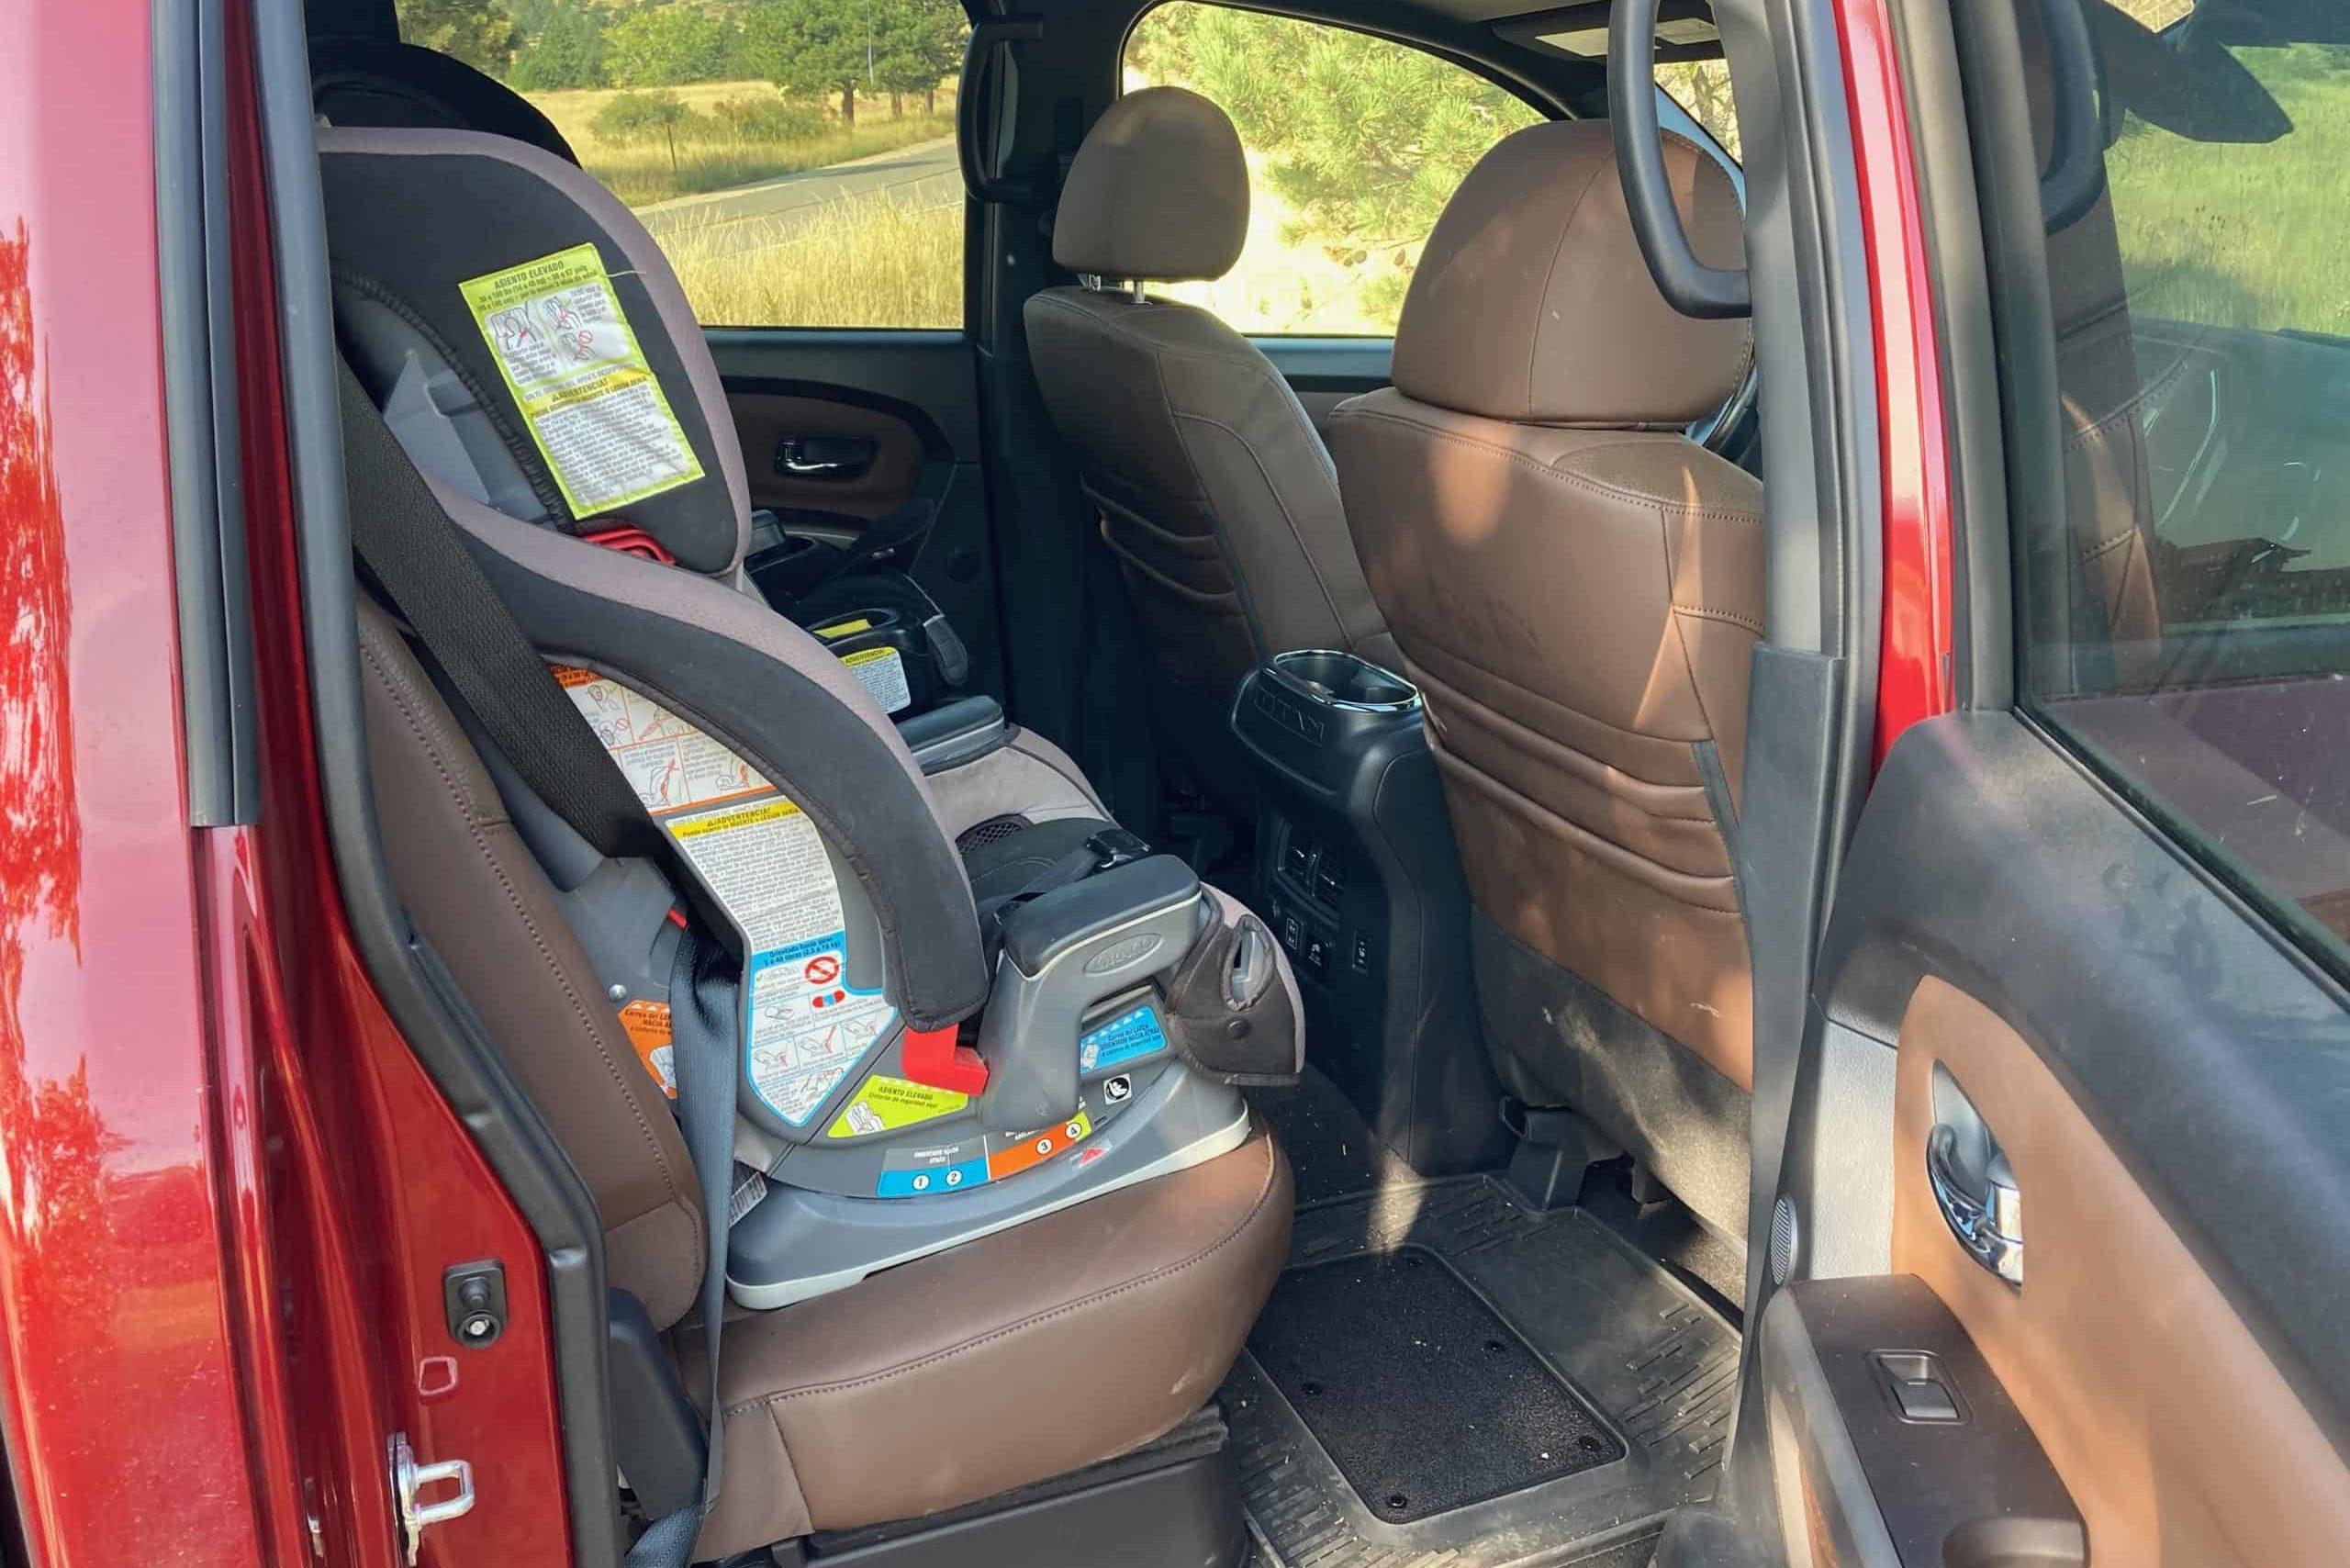 2020 Nissan Titan XD back seat car seats